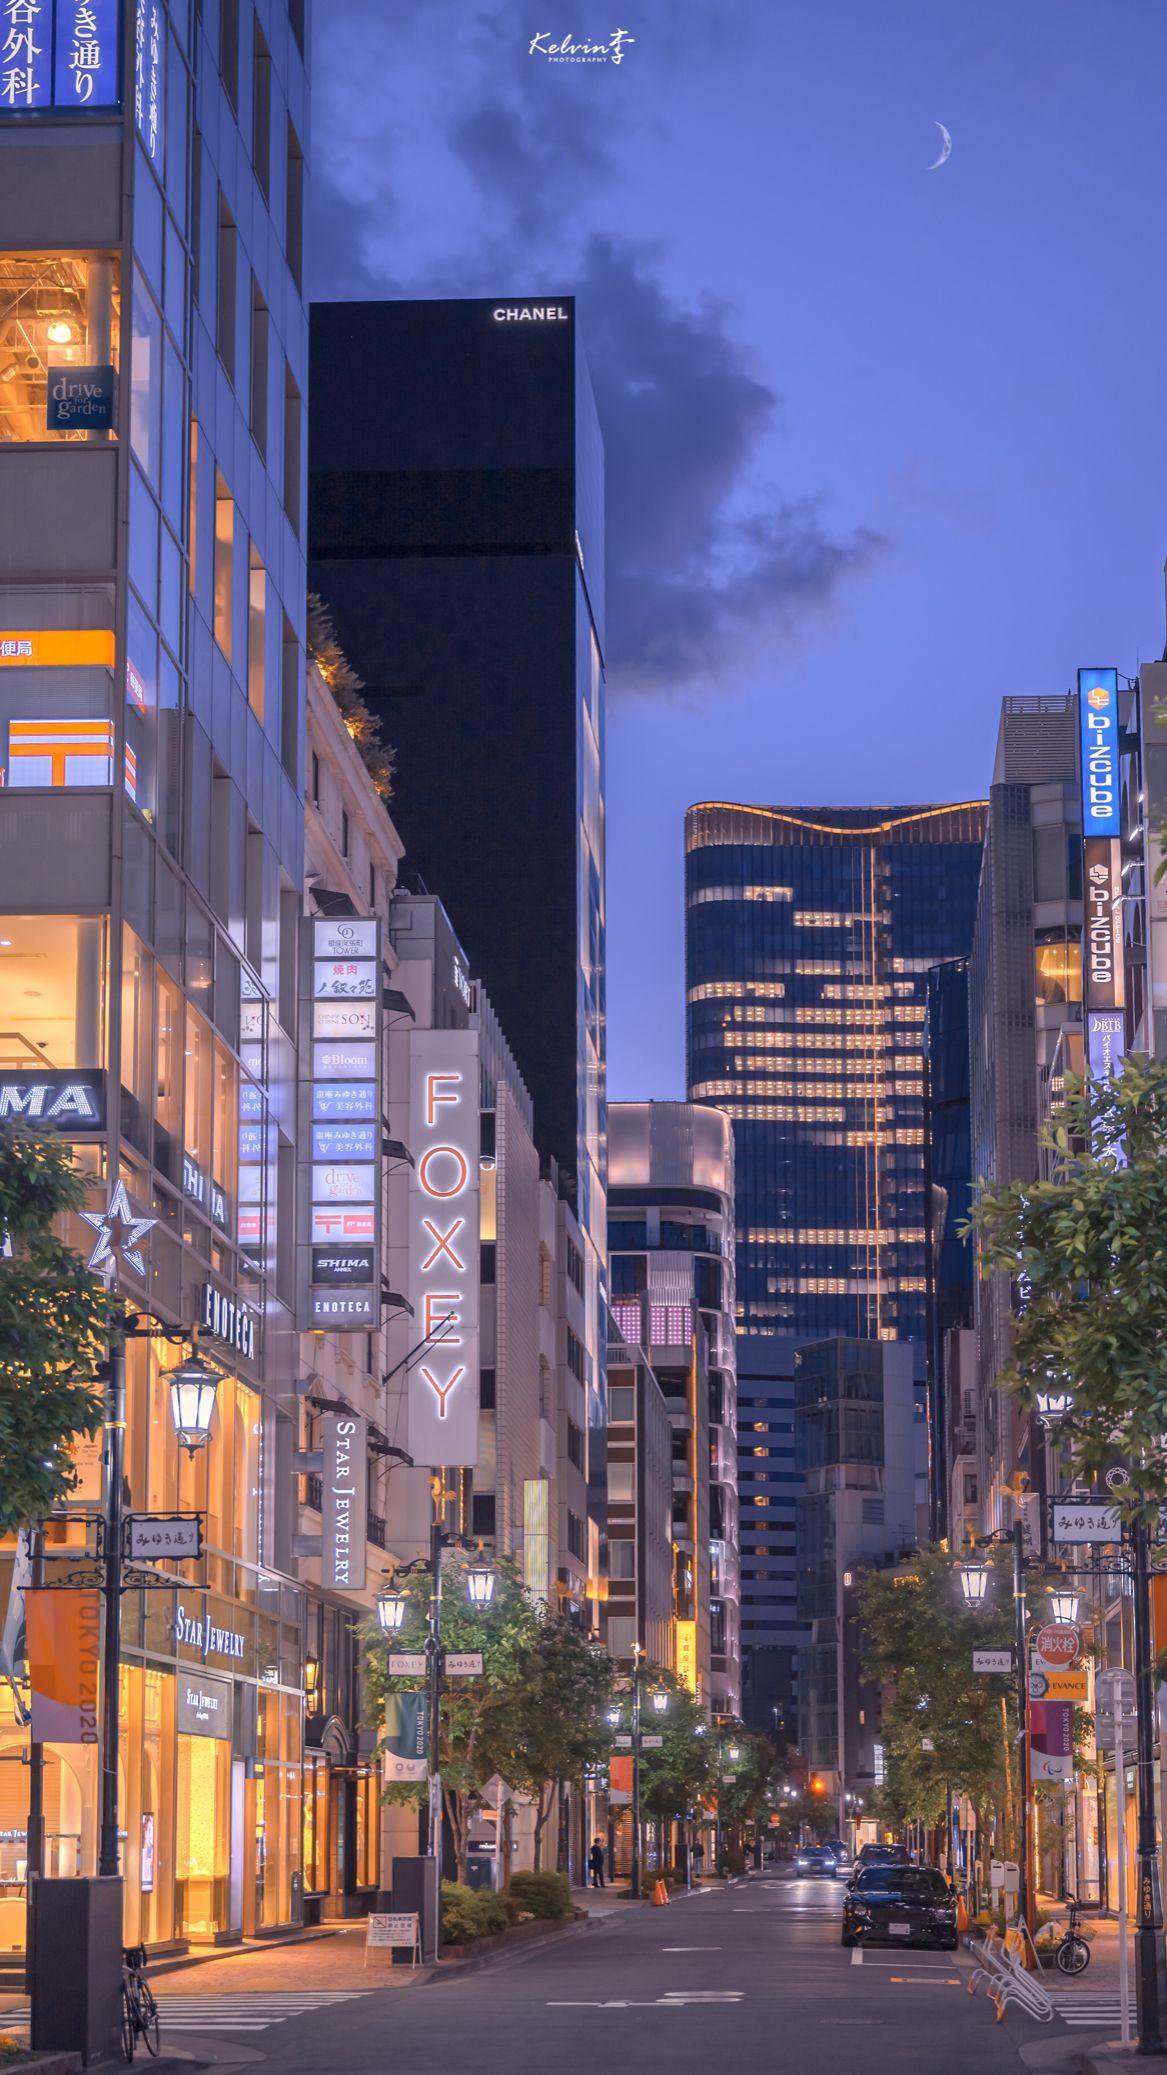 Pin Oleh Hochherzige Di View Reality Pemandangan Anime Pemandangan Abstrak Gambar Kota